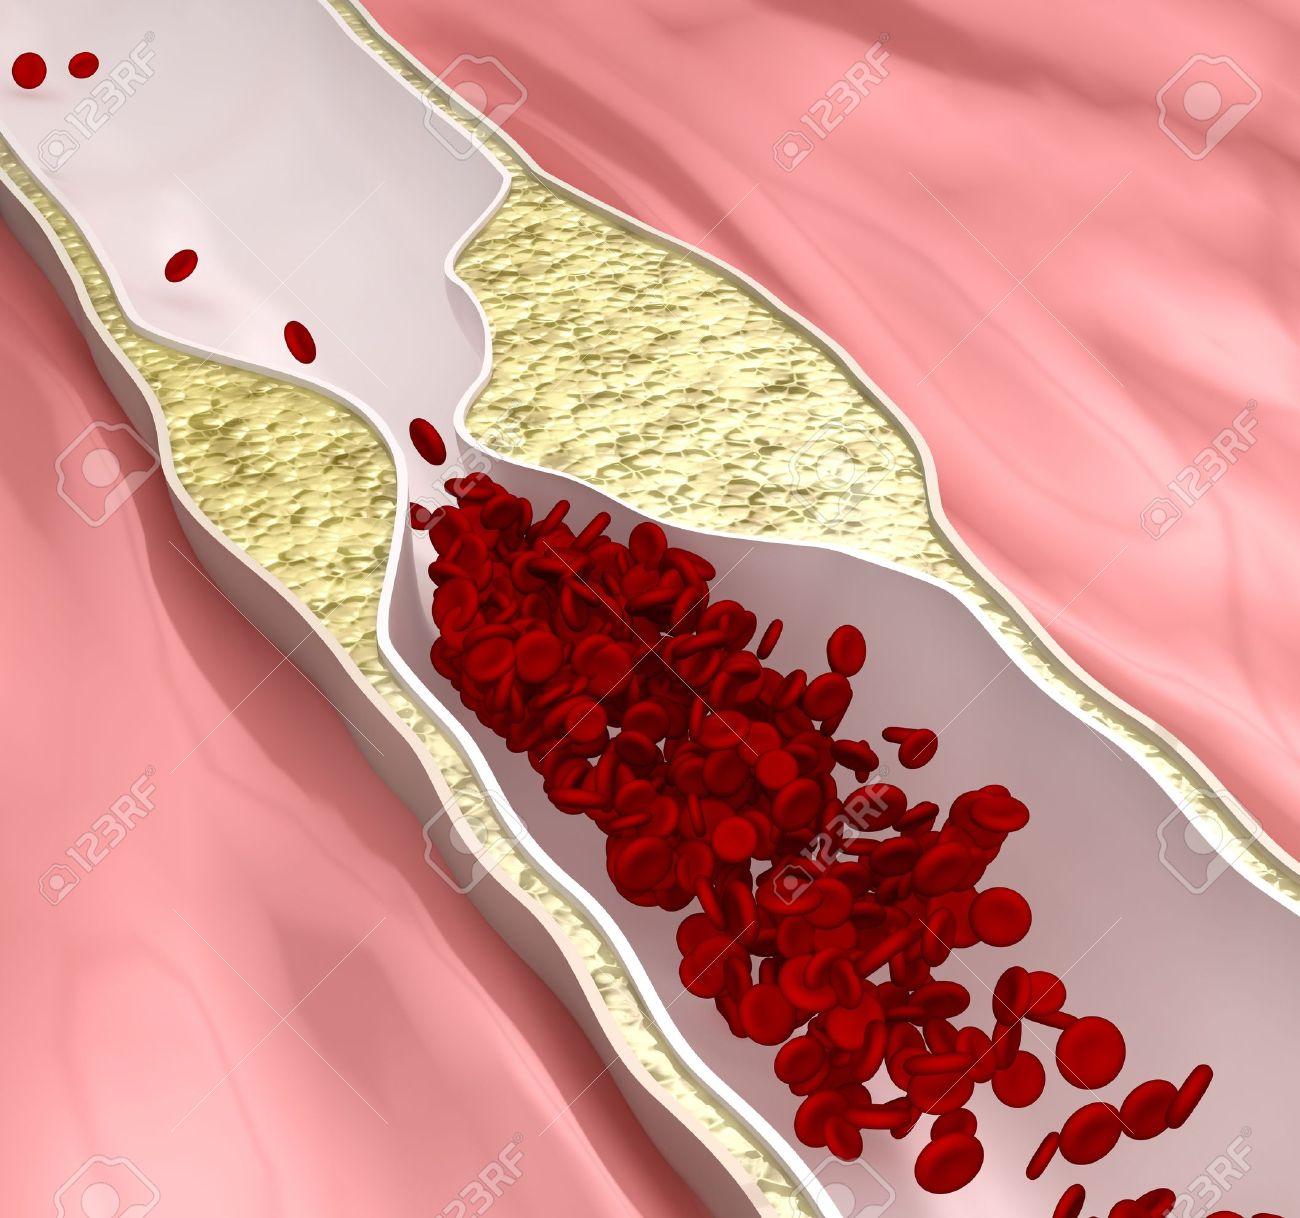 Atherosclerosis disease - plague blocking blood flow Stock Photo - 15095750